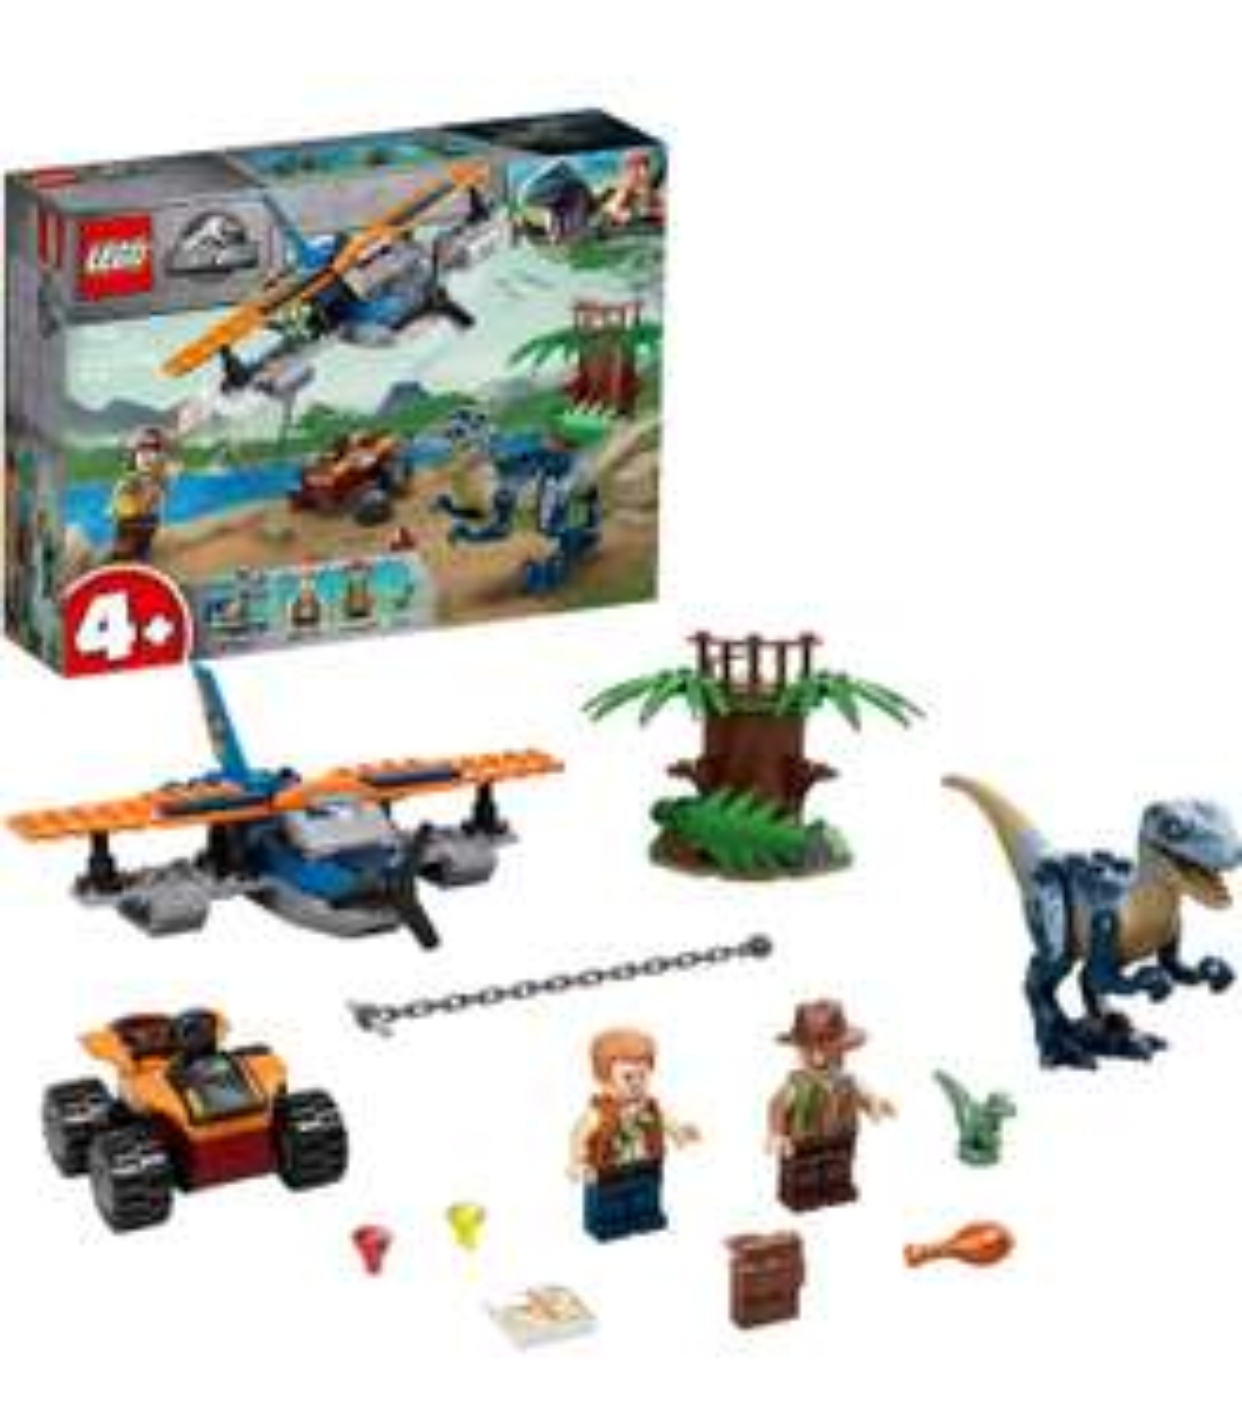 LEGO Jurassic World 4+ Velociraptor Biplane Rescue Set 75942 - £20 at Argos